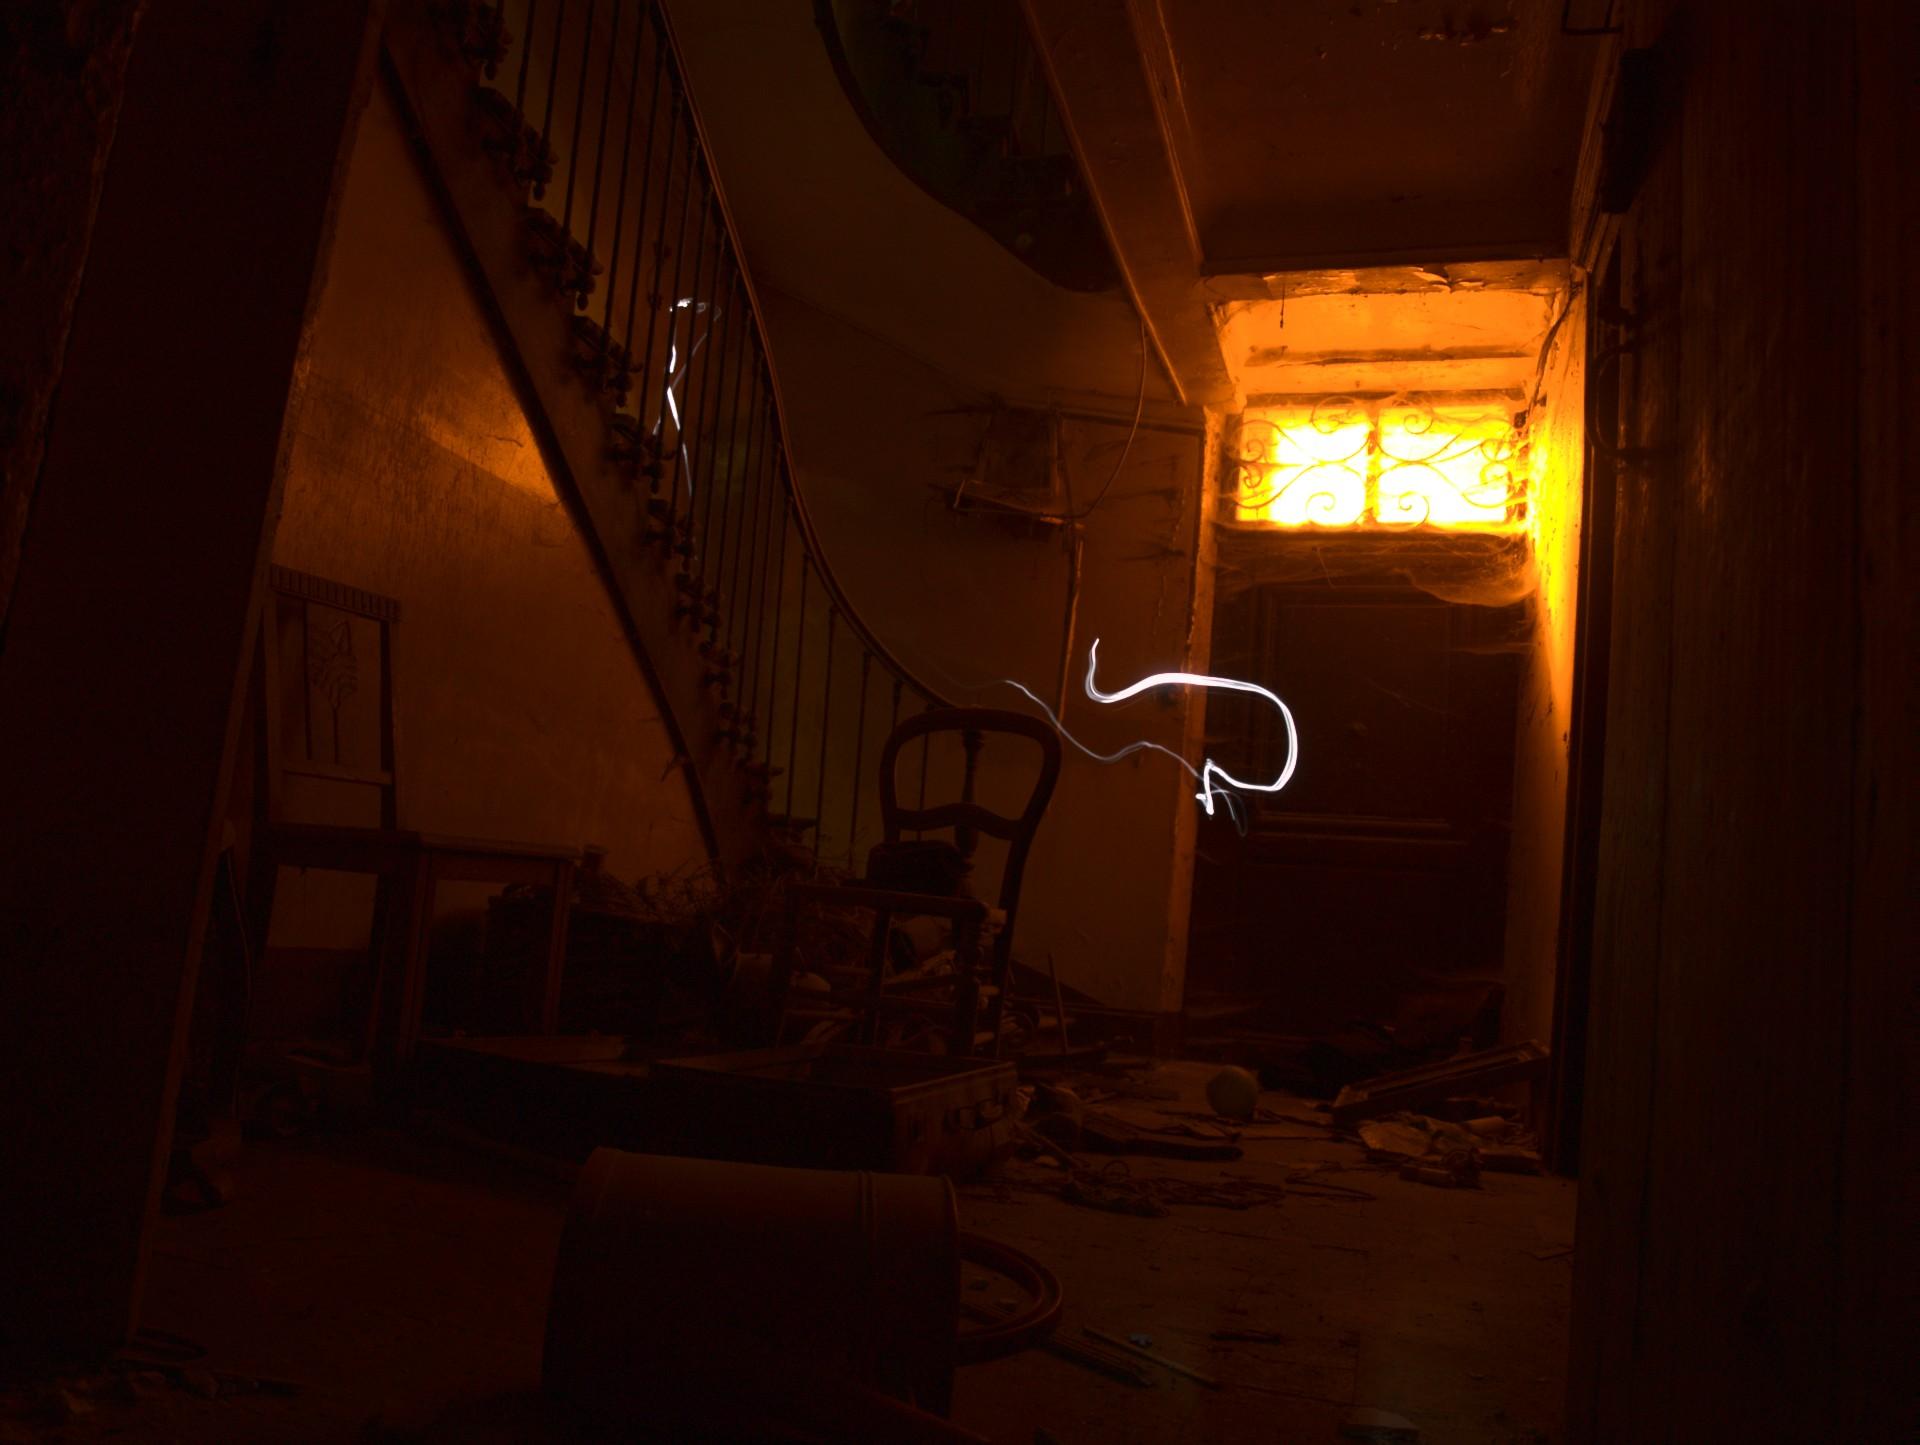 haunted House 0x01